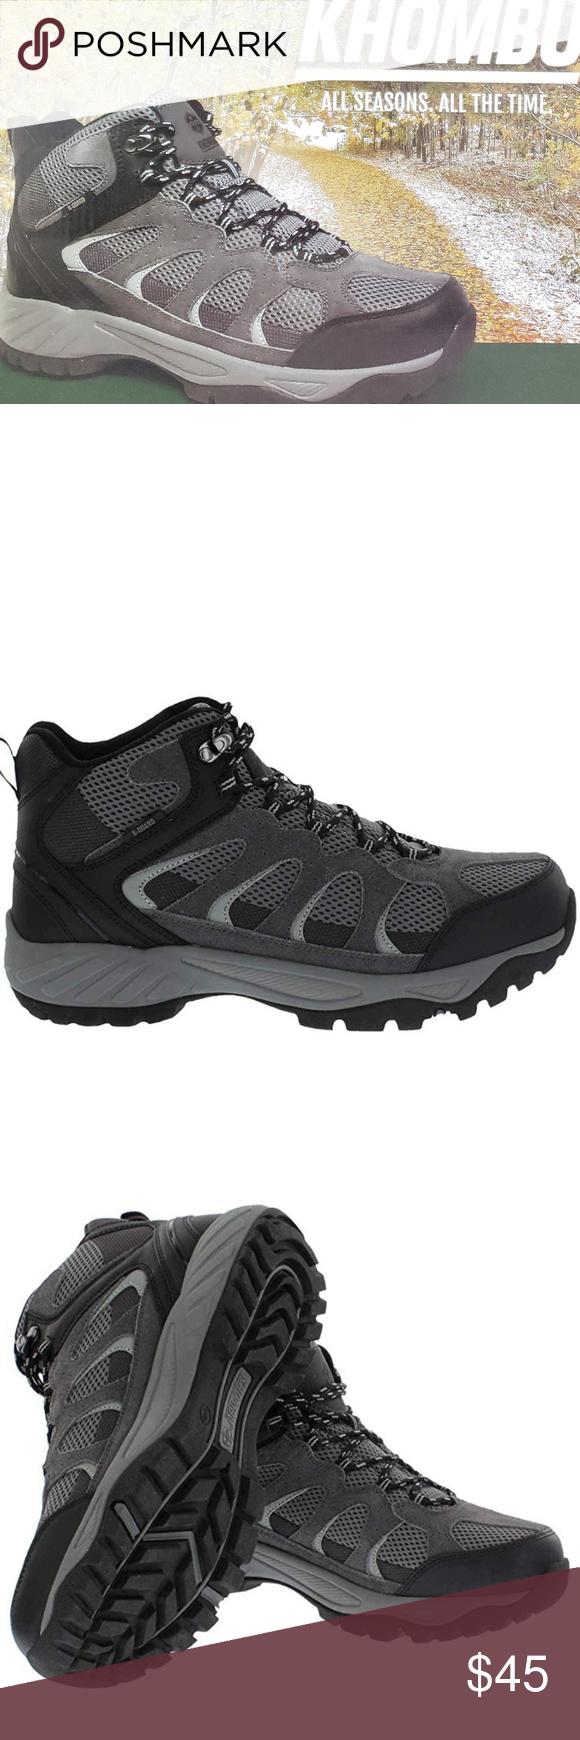 c0f67dd76dc Khombu Tyler Leather Hiking Outdoor Tactical Boots Khombu, an ...